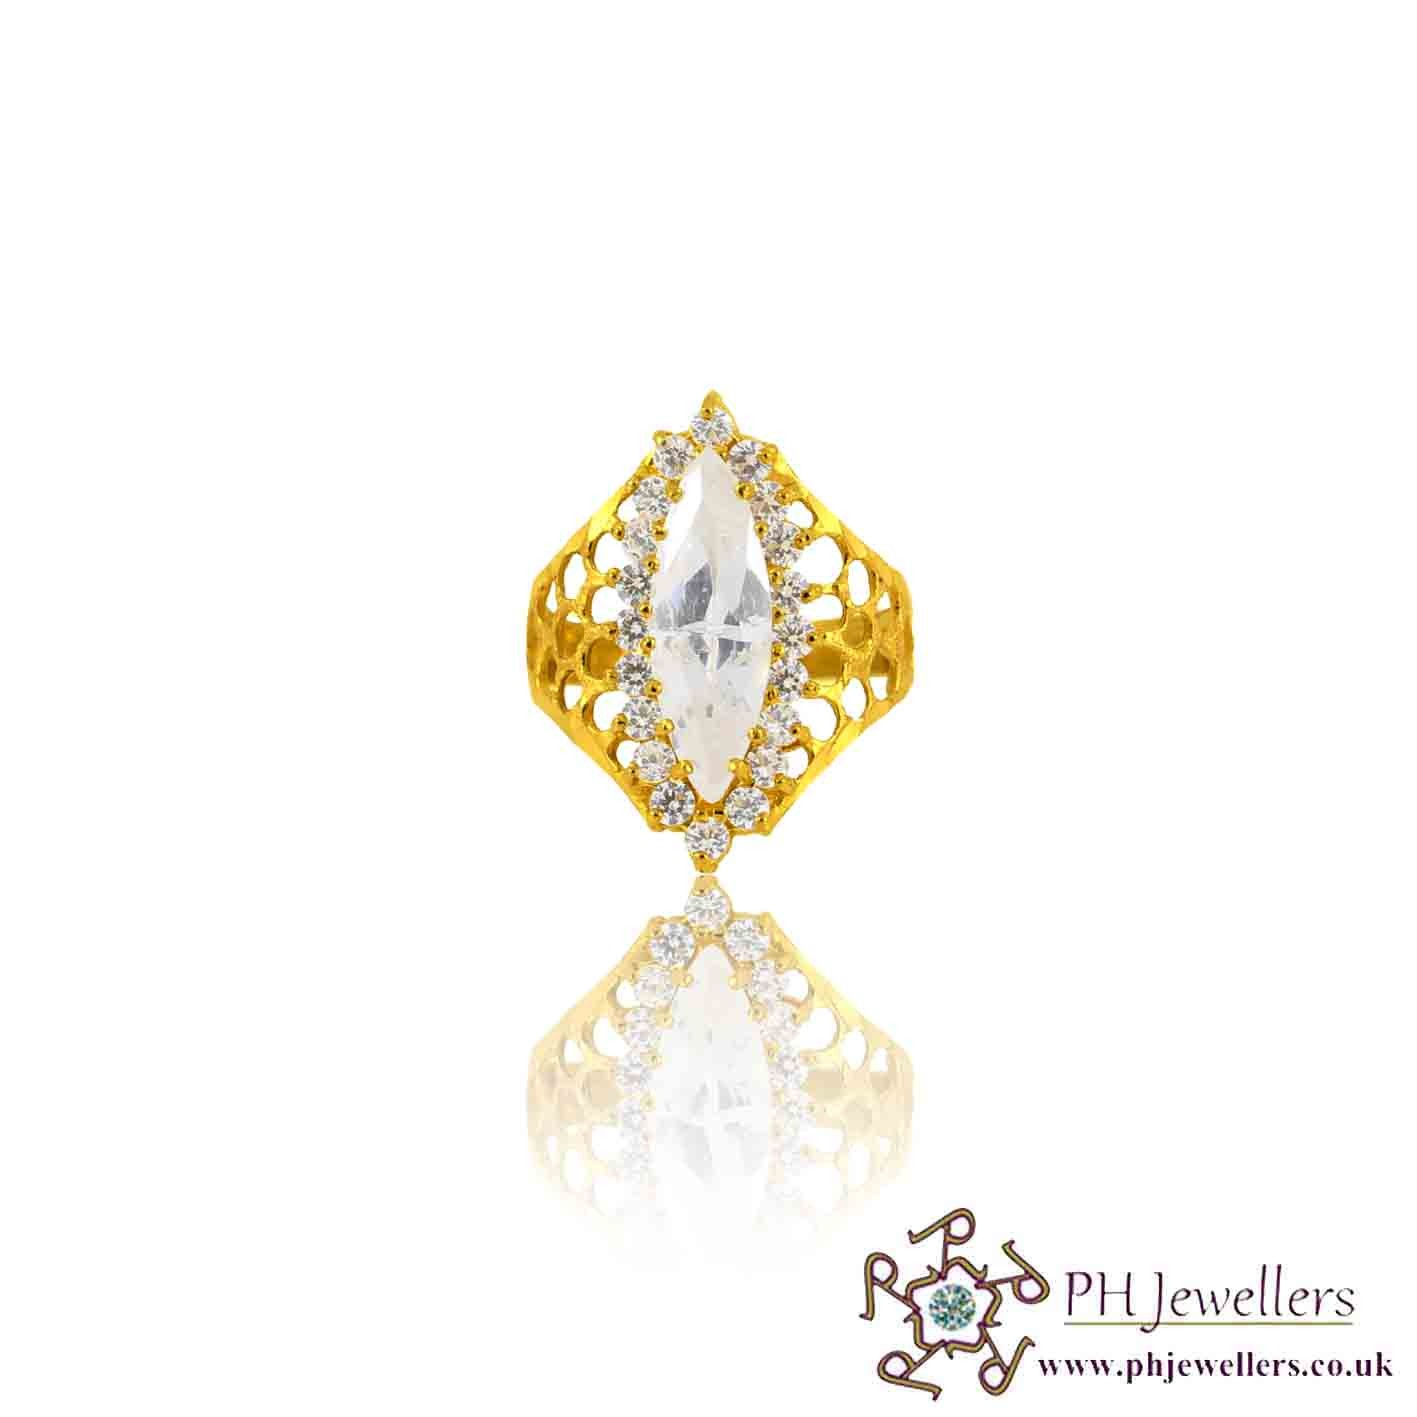 22ct 916 Yellow Gold Hallmark Marquise Ring CZ Size P ,Q,R SR116